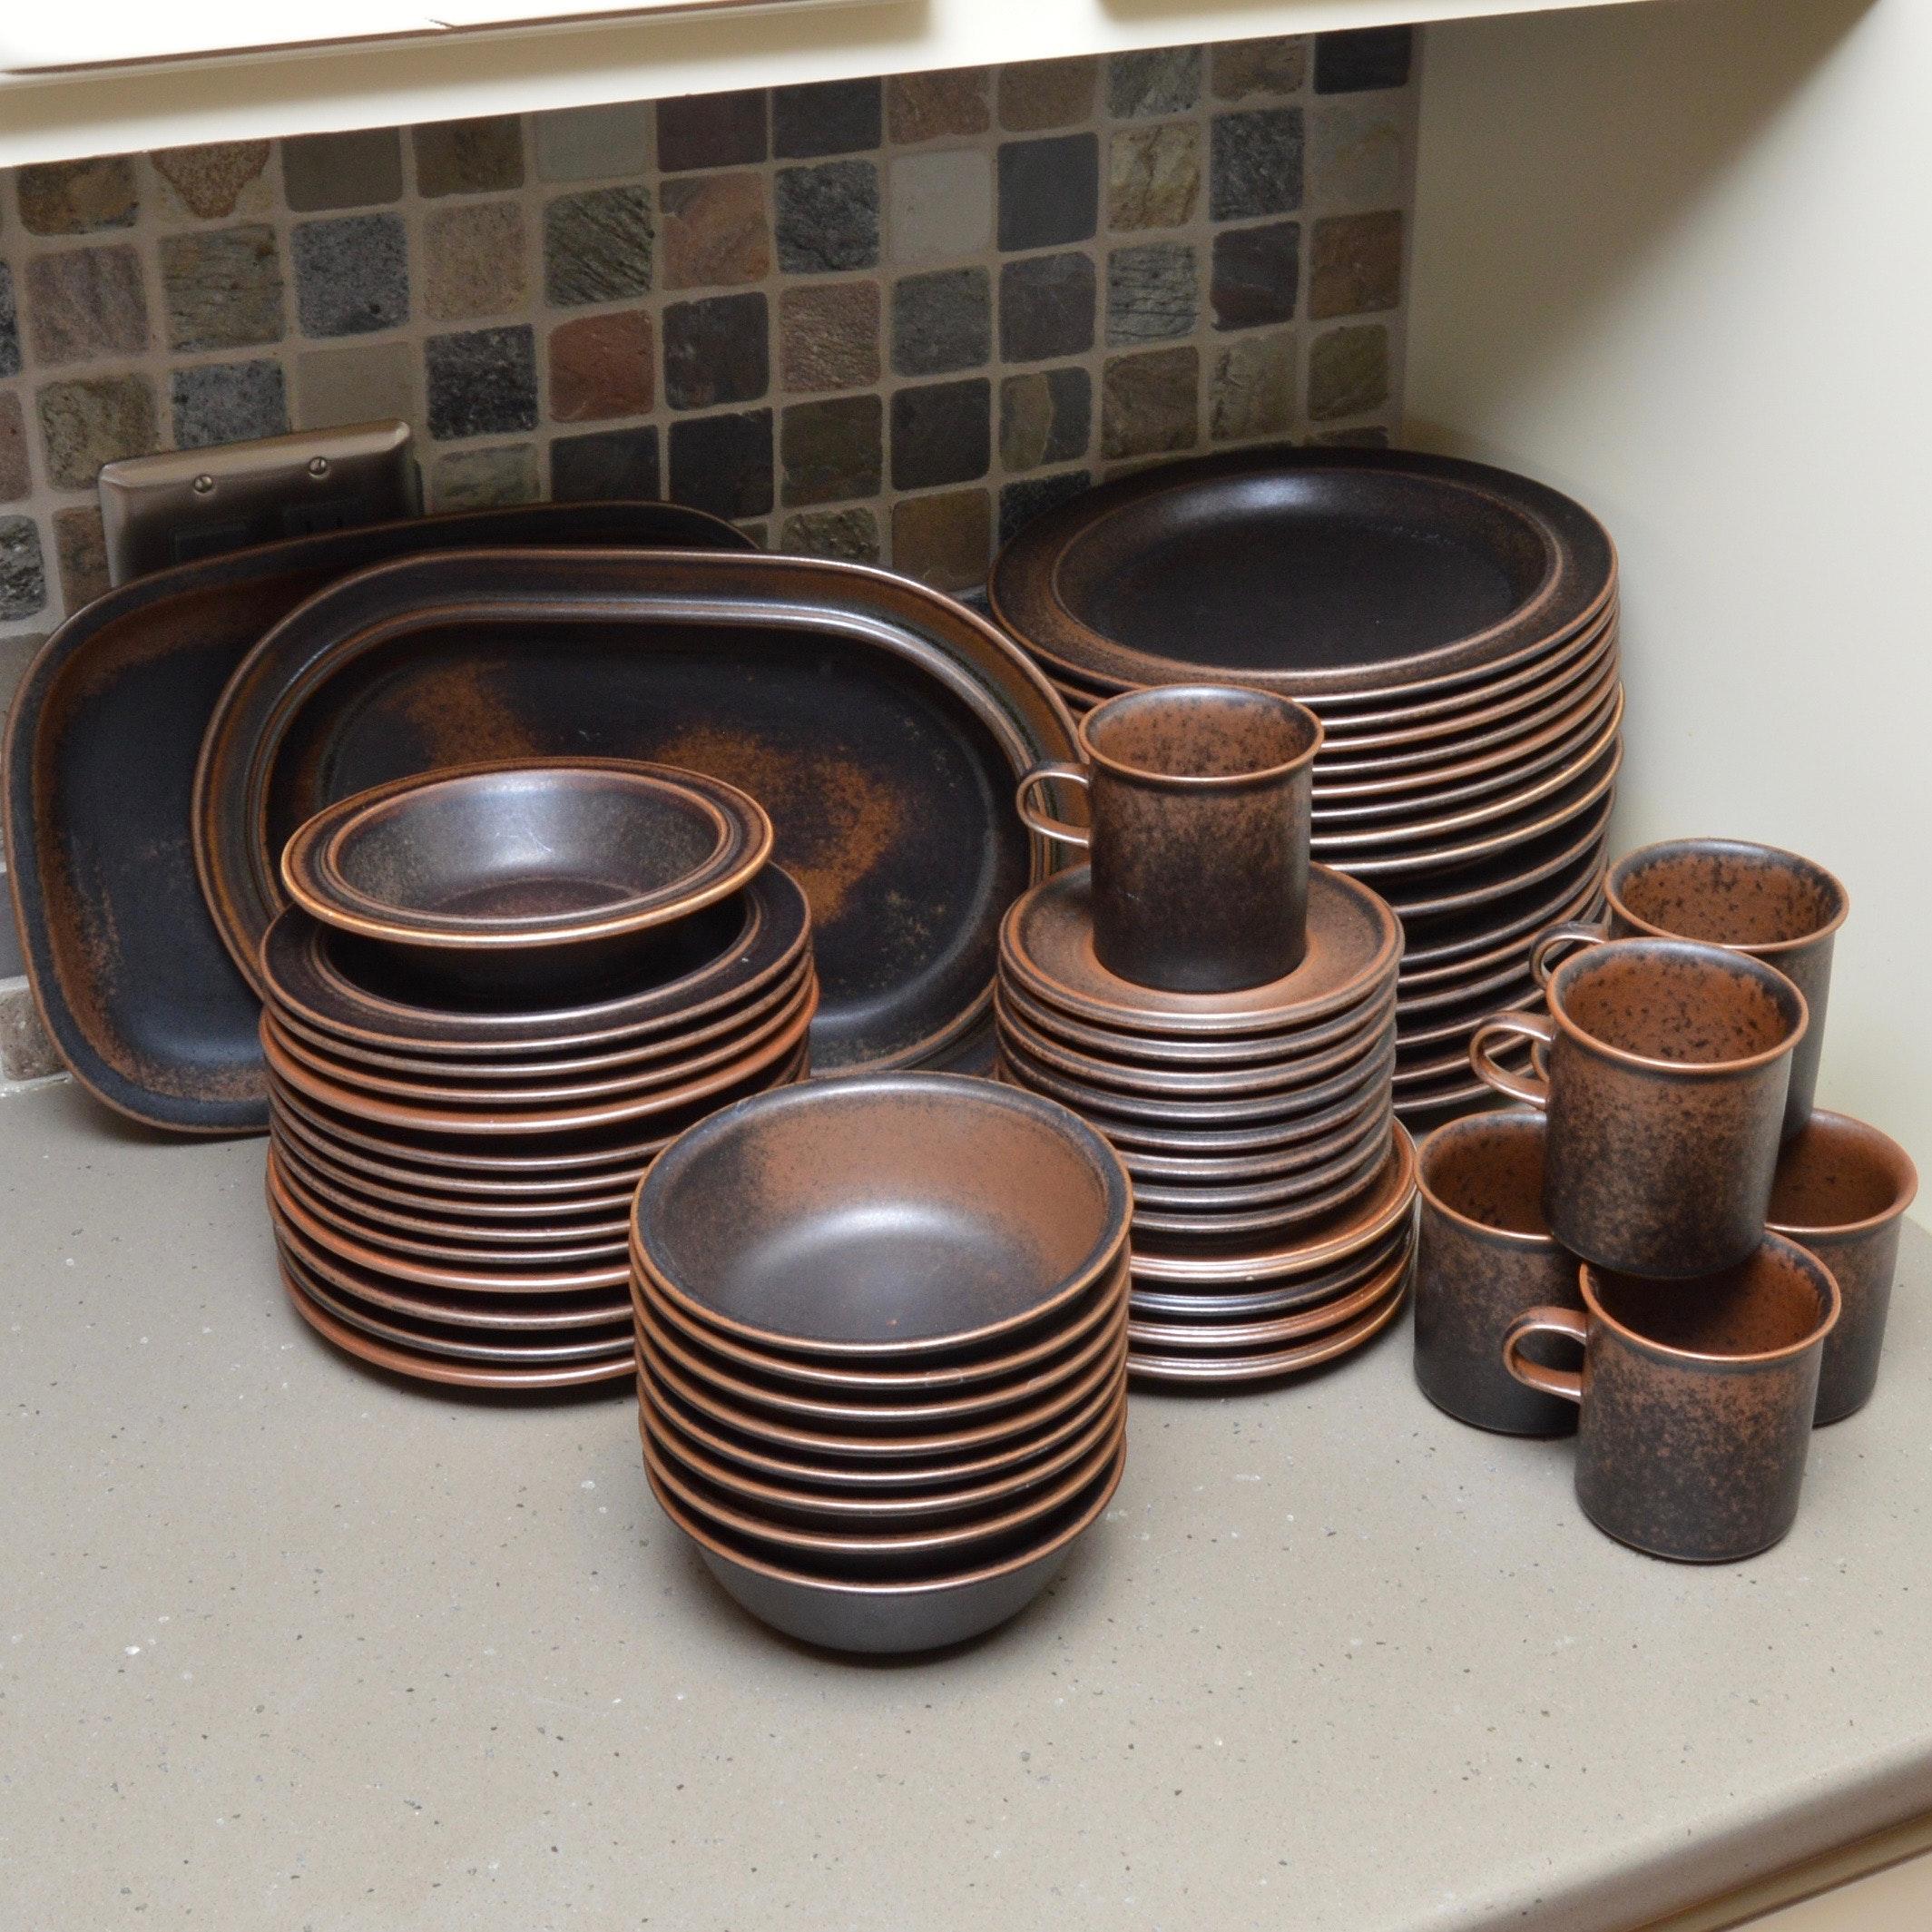 Ruska  Dinnerware Collection by Arabia of Finland ... & Ruska